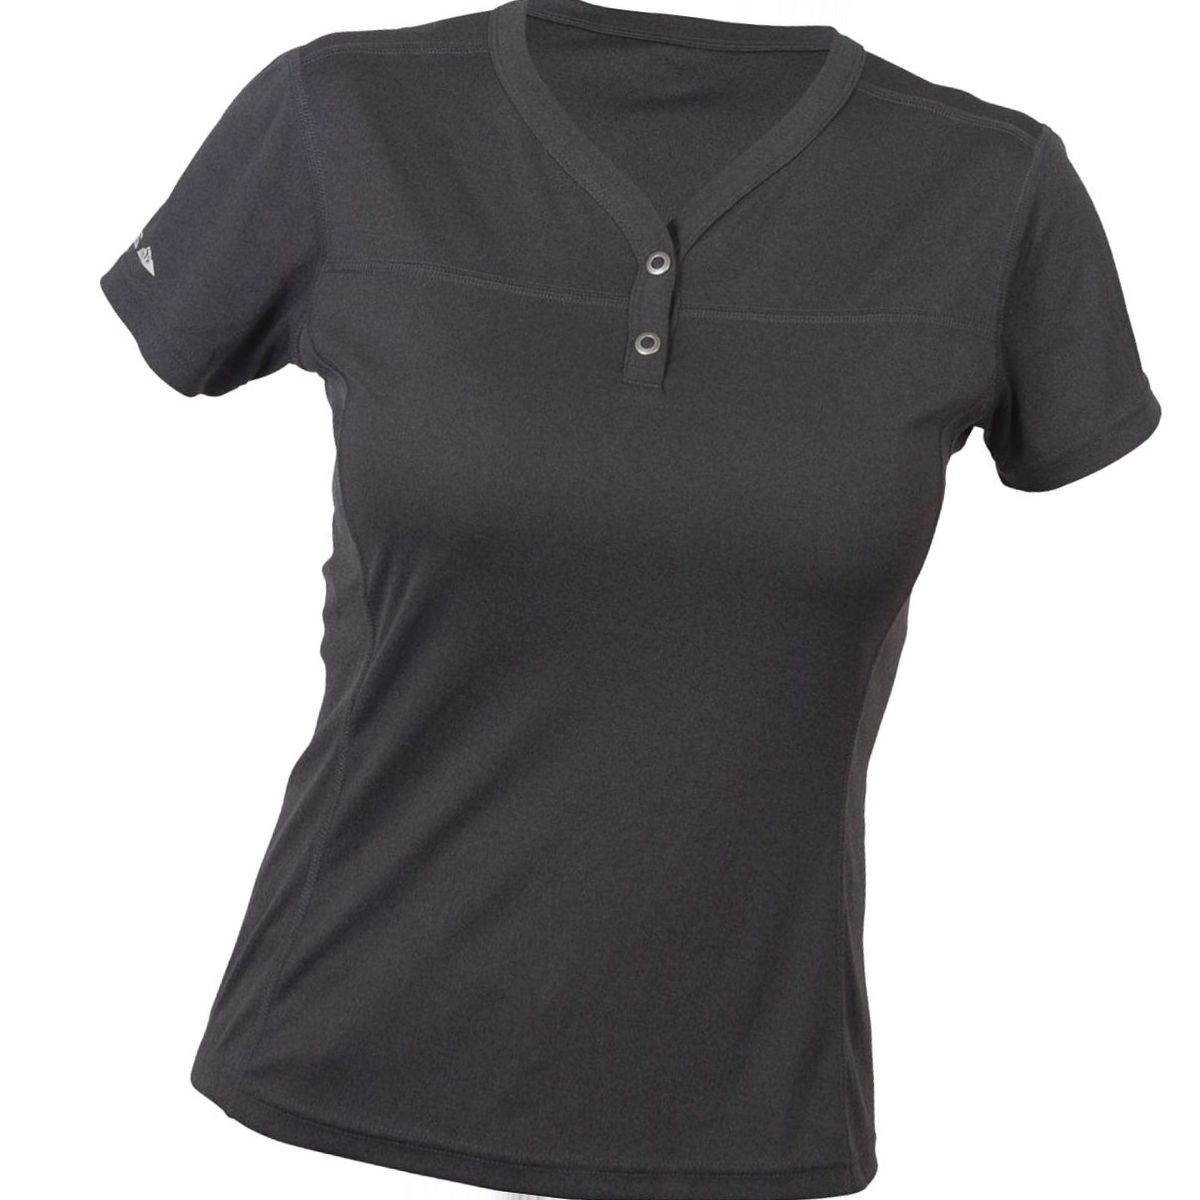 ZOIC Henley Short-Sleeve Jersey - Women's